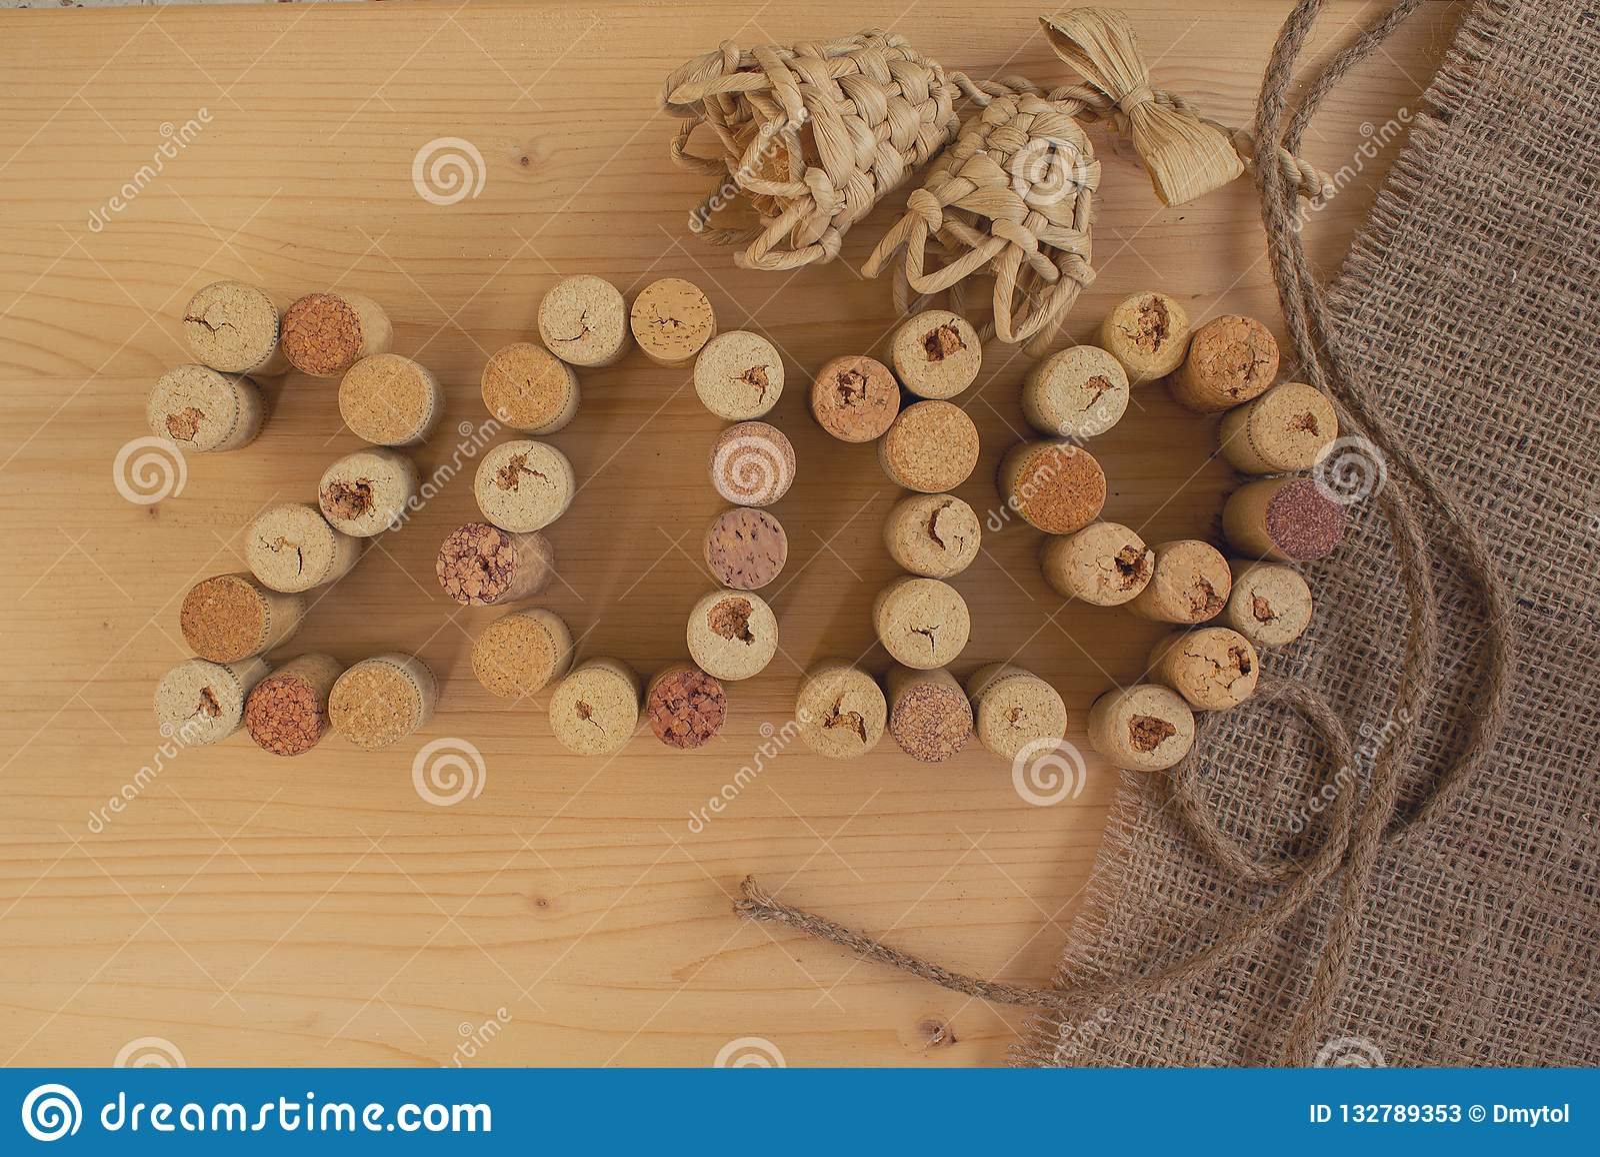 Wine Corks Closeup 2019. New Year Stock Image - Image of ...